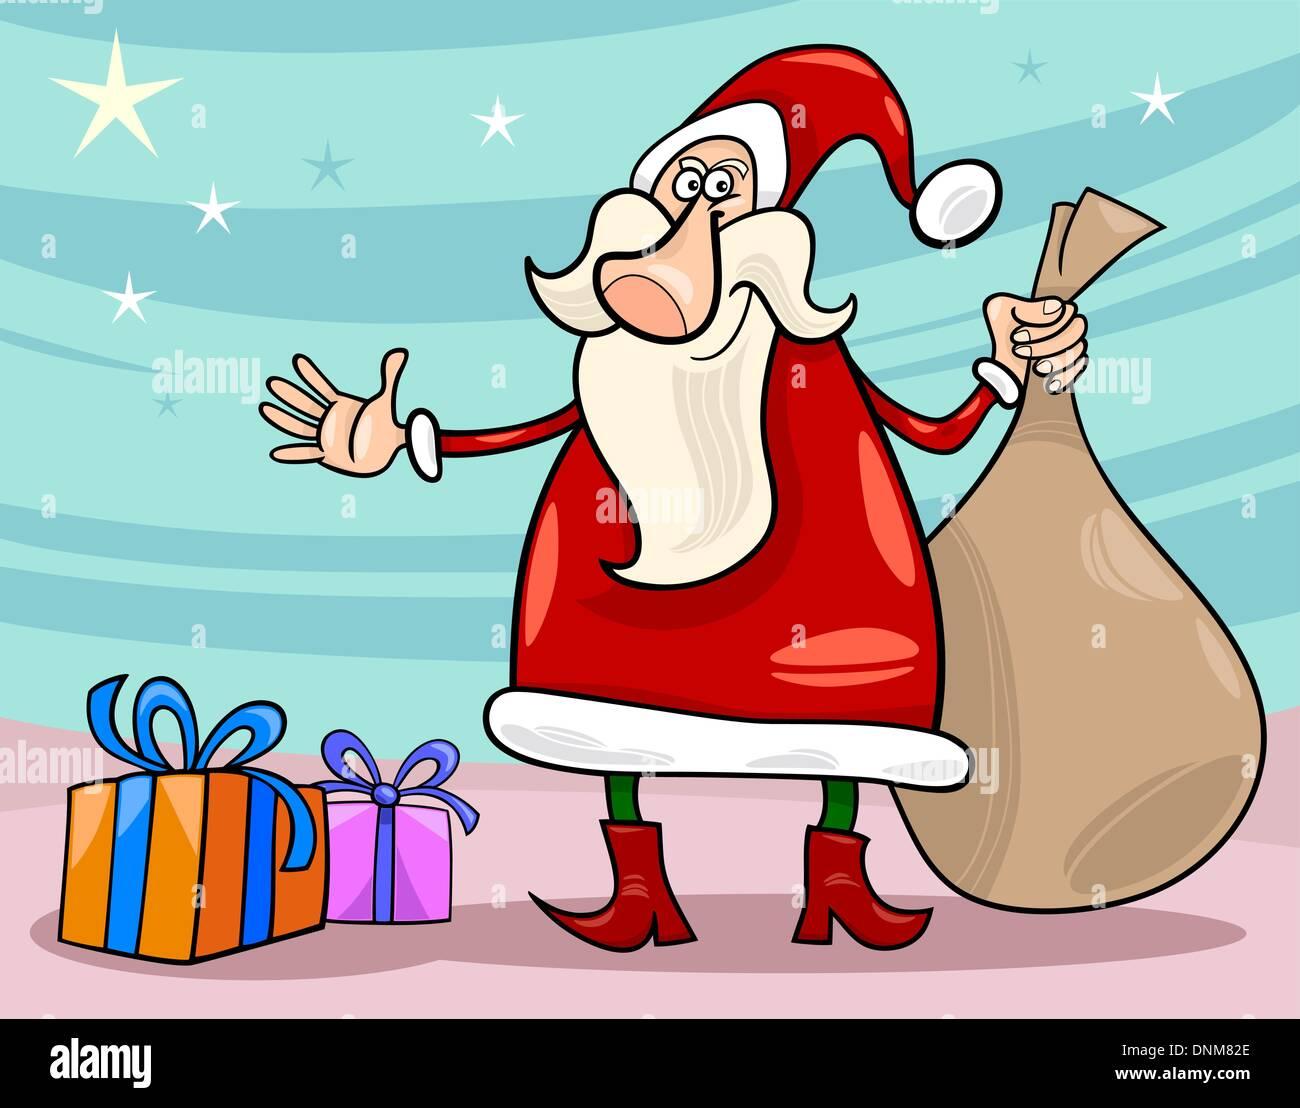 cartoon illustration of funny santa claus or papa noel with